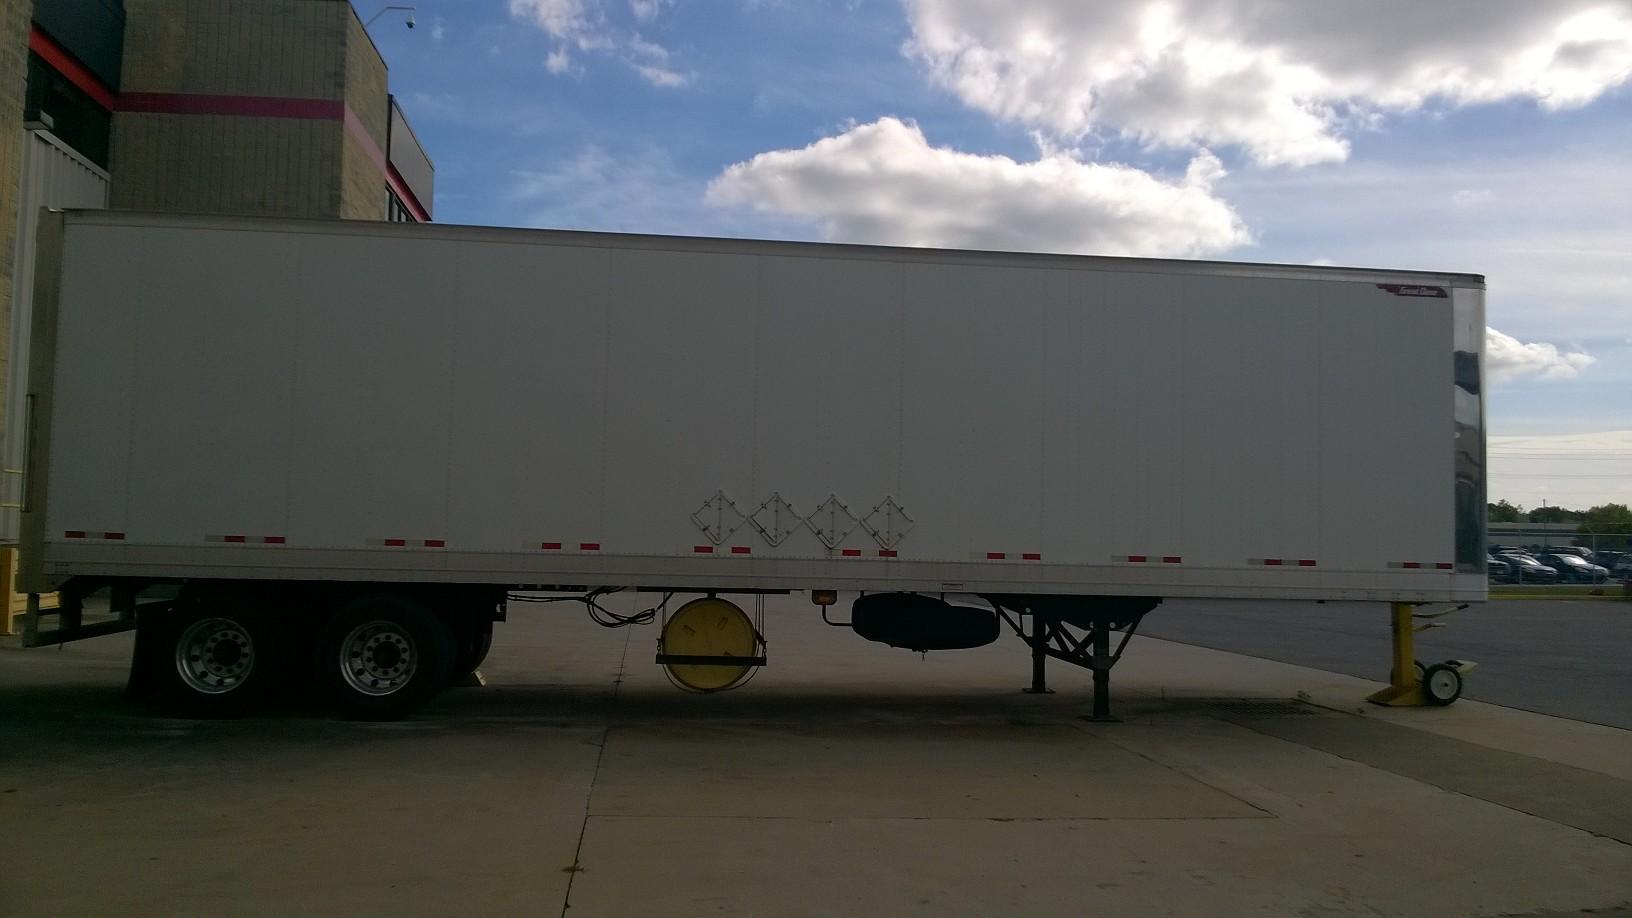 Lot 4 - 2014 Great Dane 40' Tandem Axle Dry Van Trailer